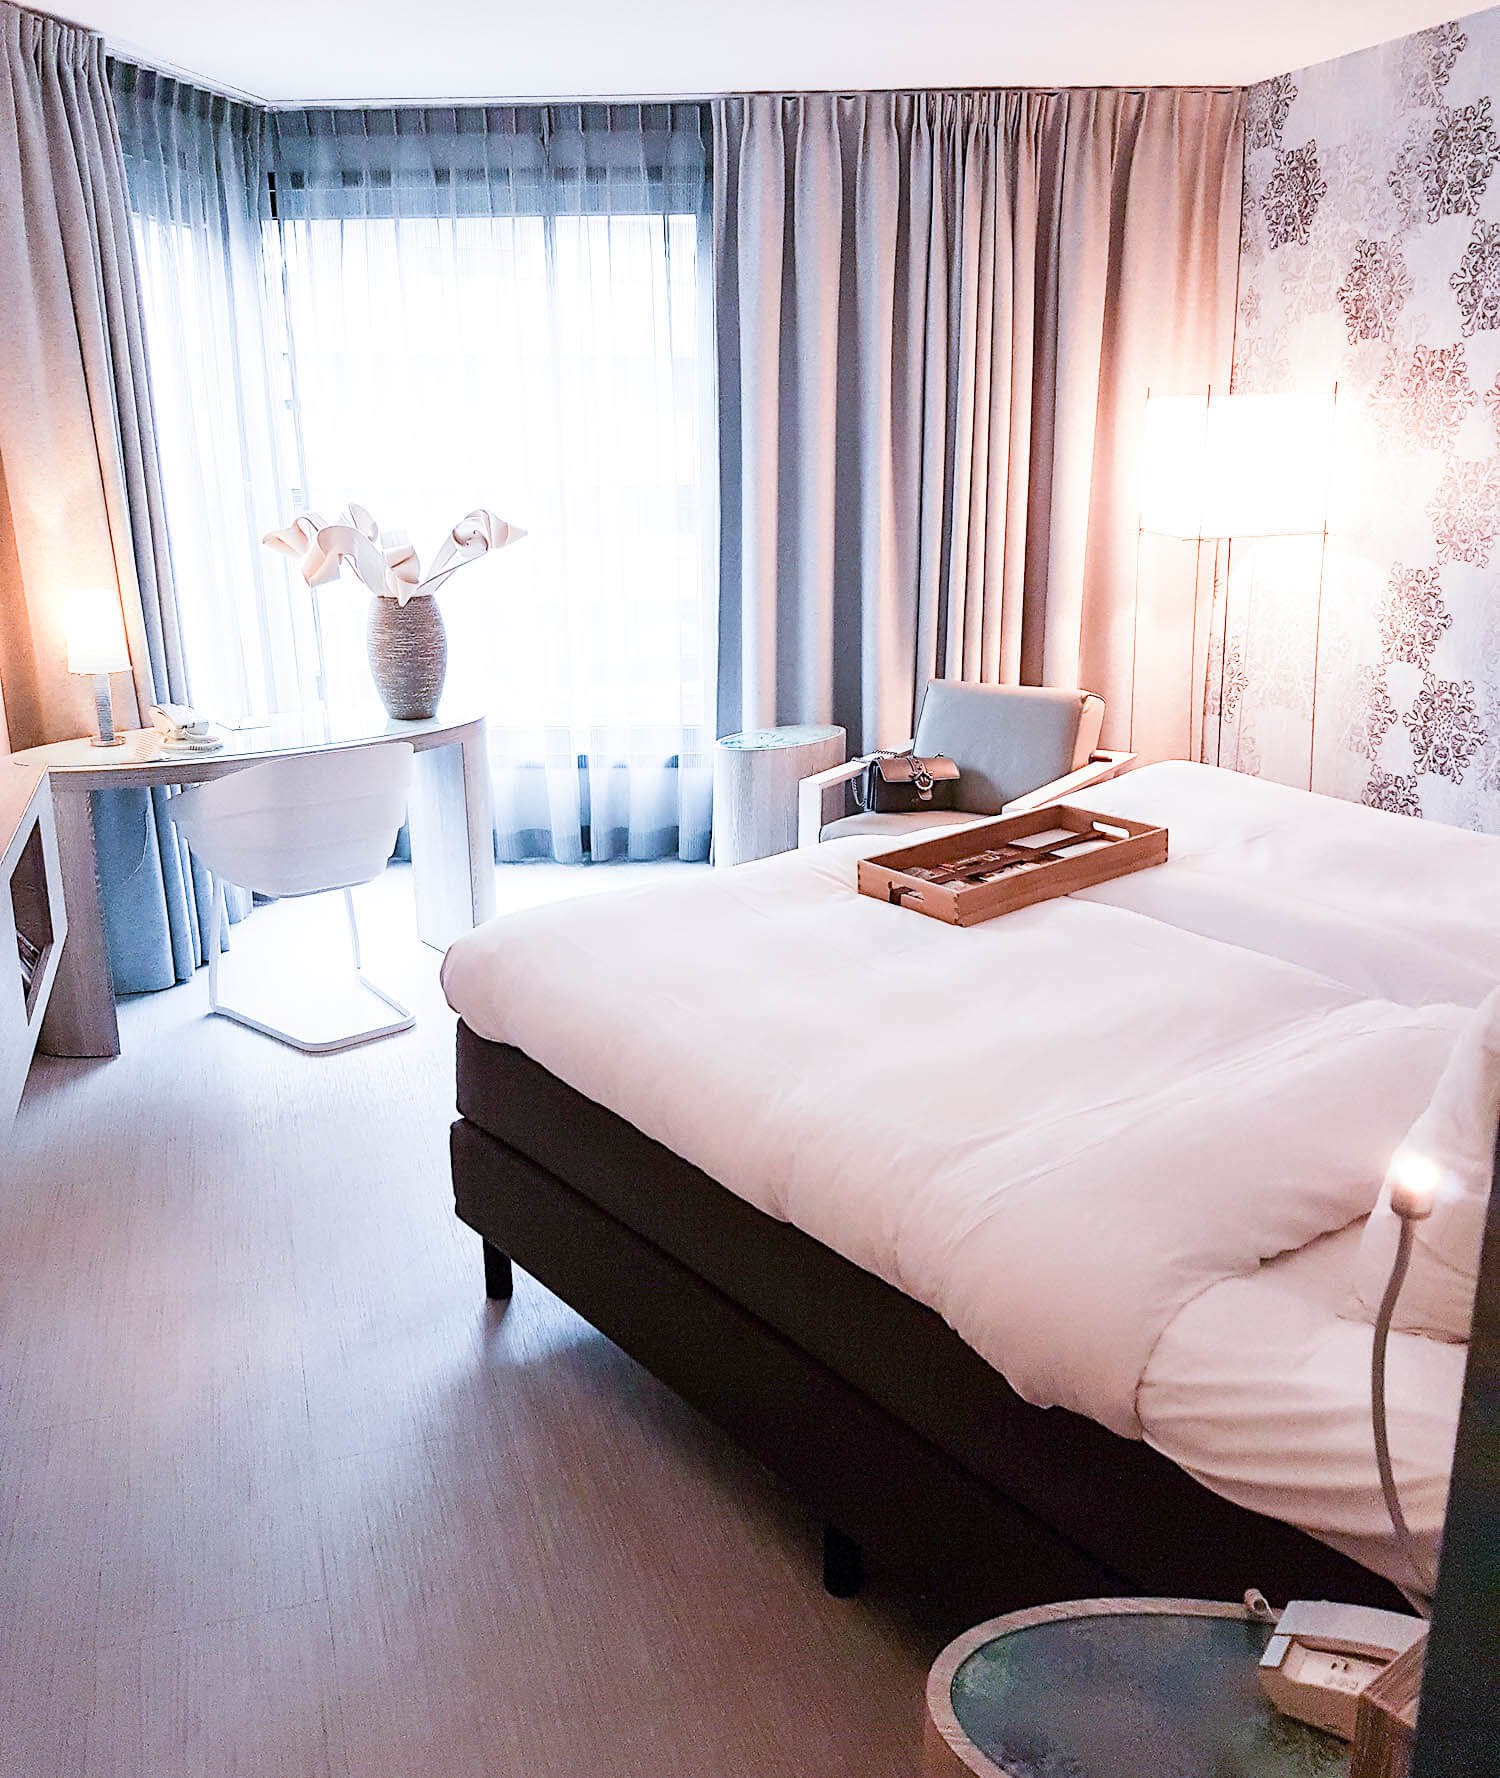 Travel-Mainport-Hotel-Rotterdam-lifestyleblogger-travelblogger-netherlands-hoteltip